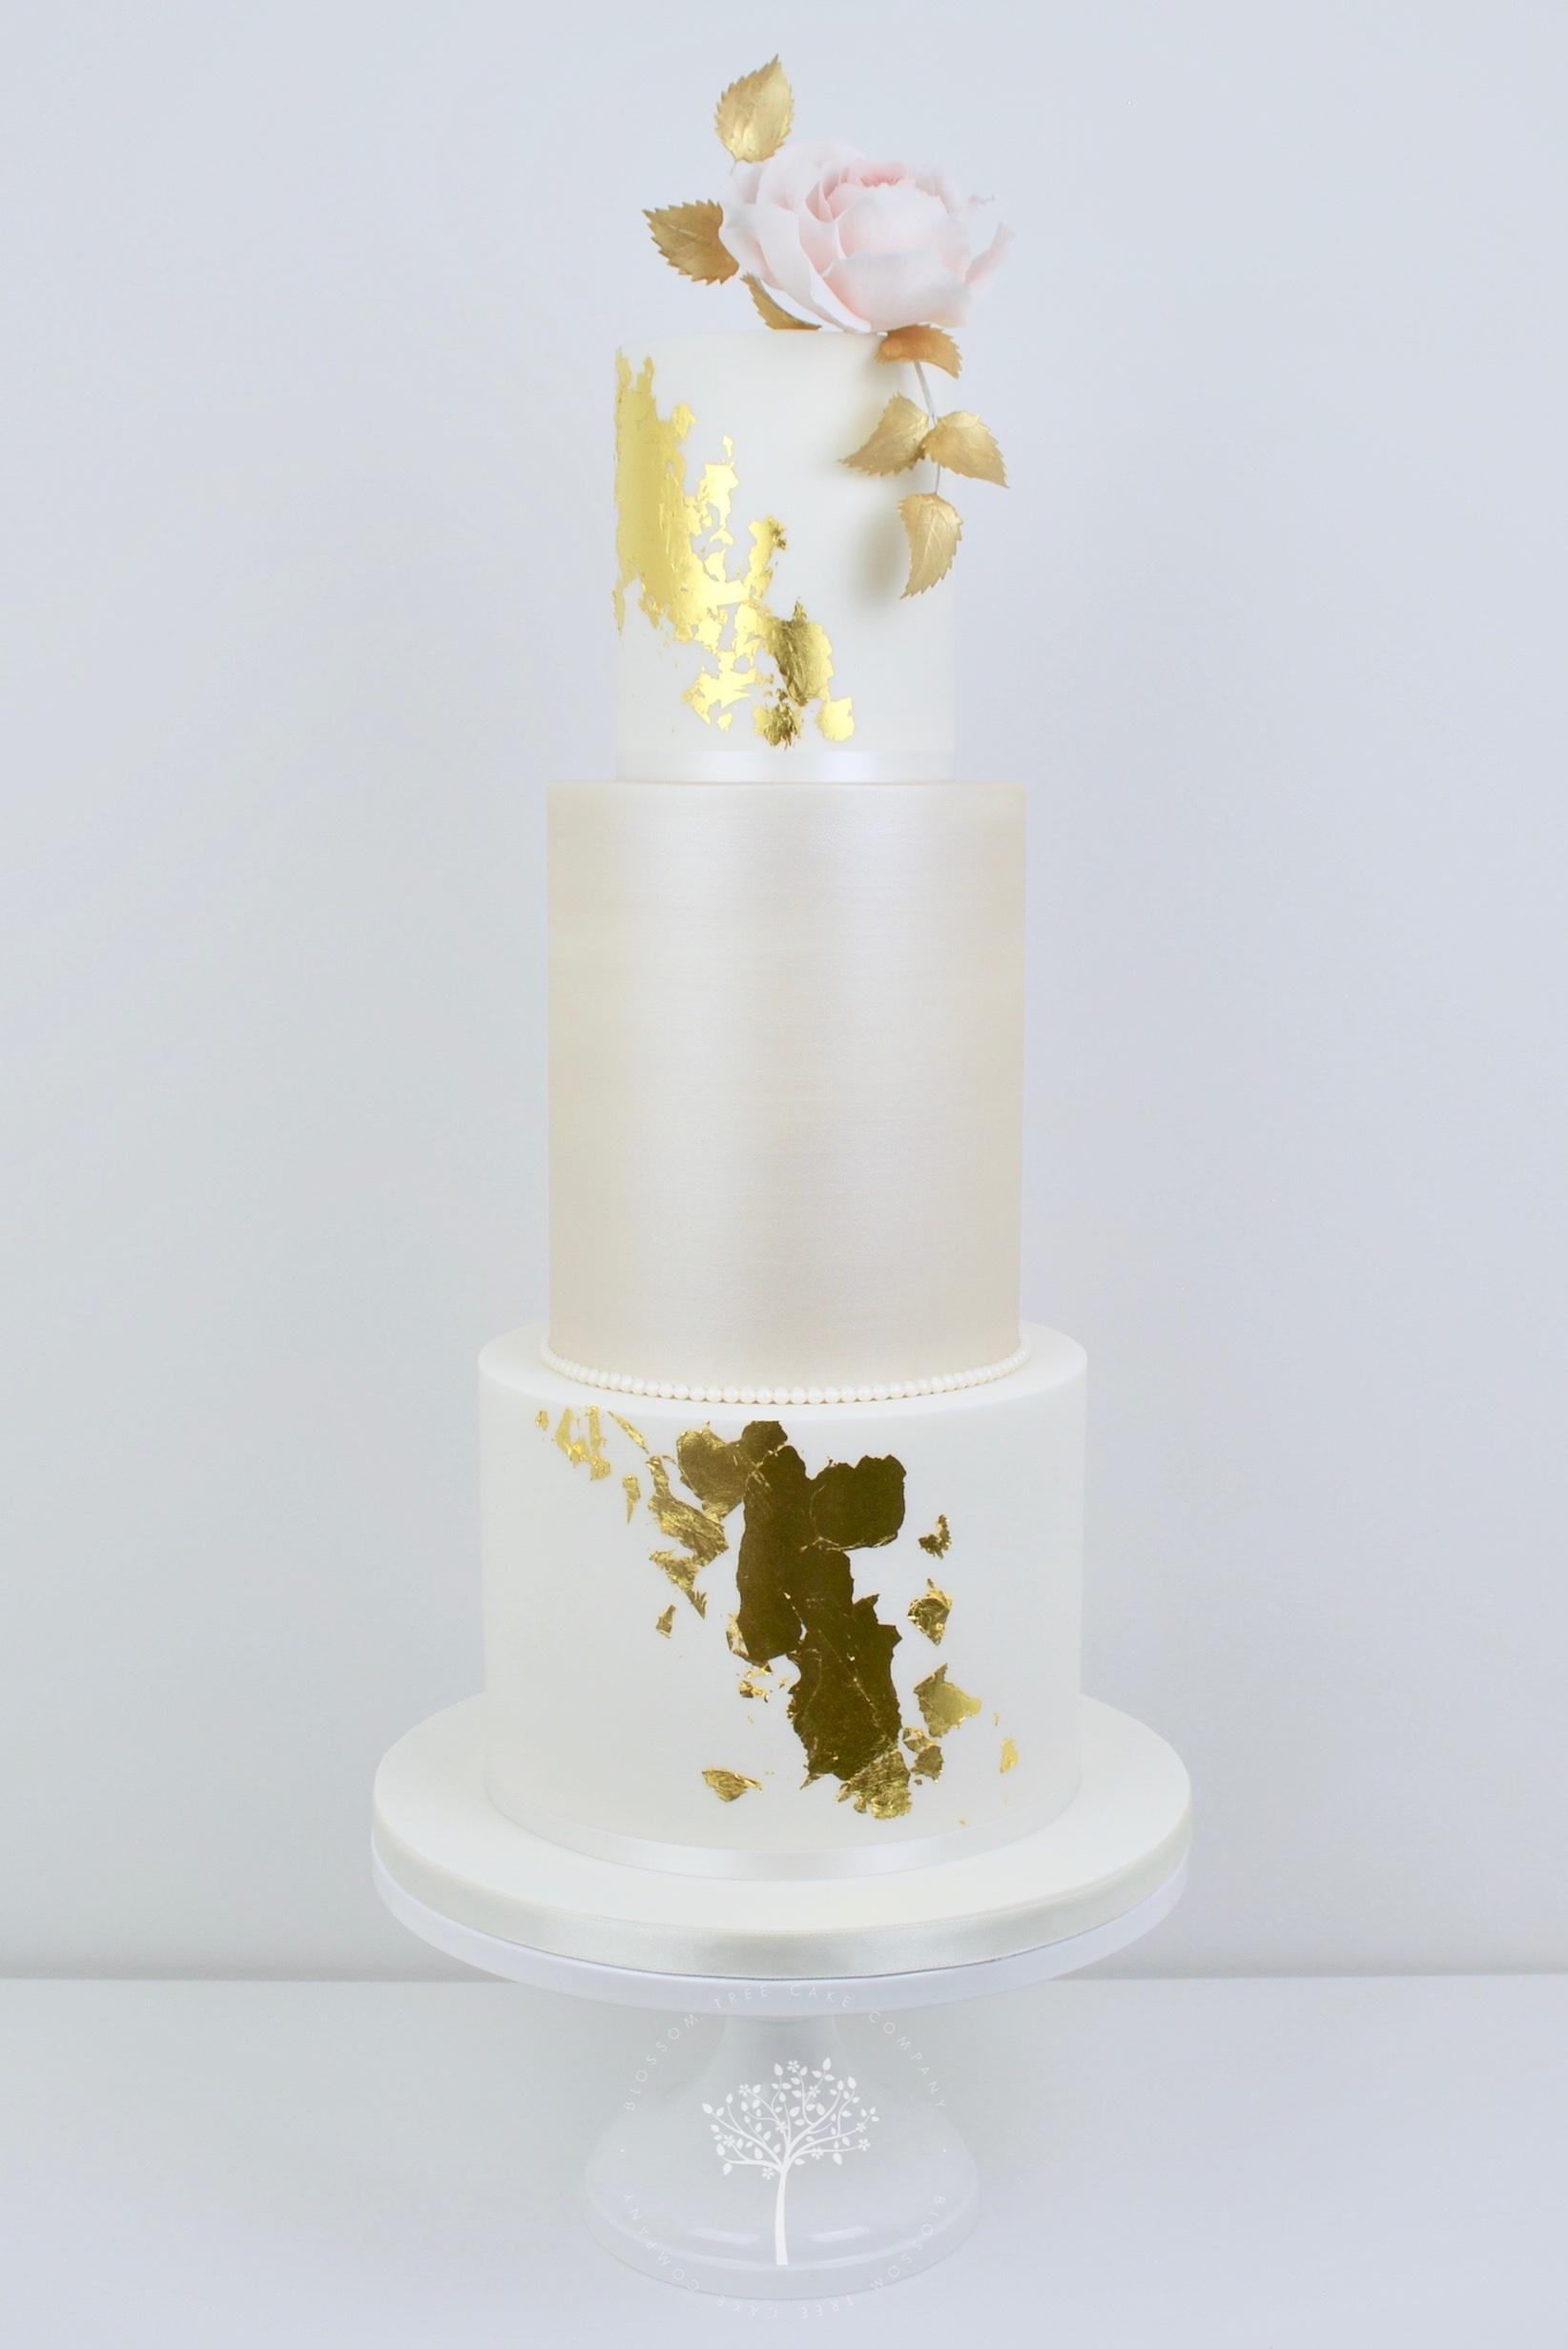 Blush Rose and Champagne wedding cake by Blossom Tree Cake Company Harrogate North Yorkshire.jpg